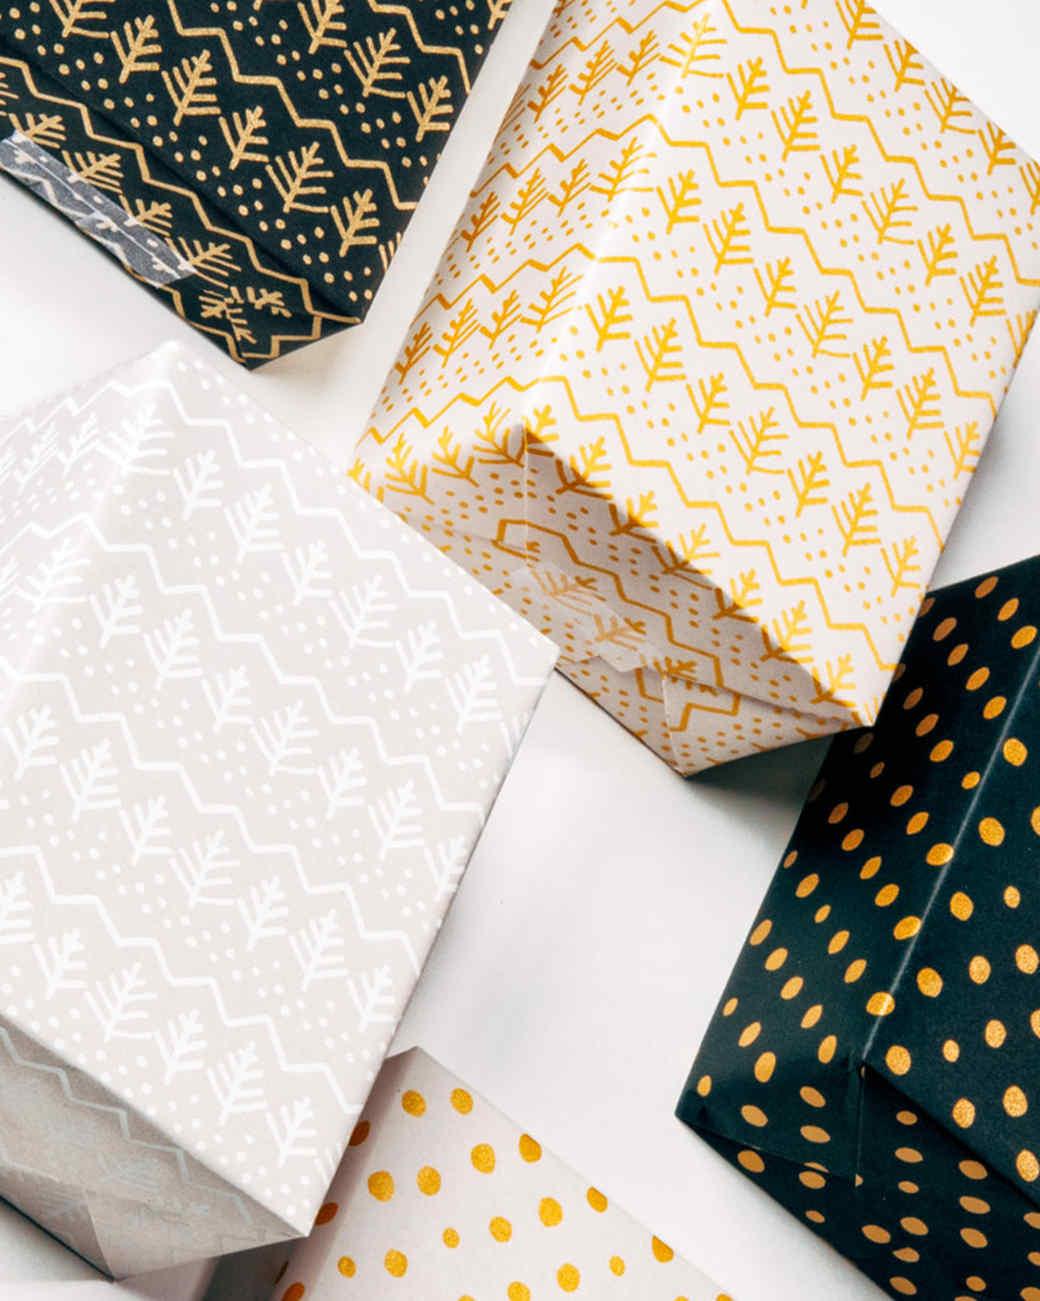 coordinated-gift-wrap-1215.jpg